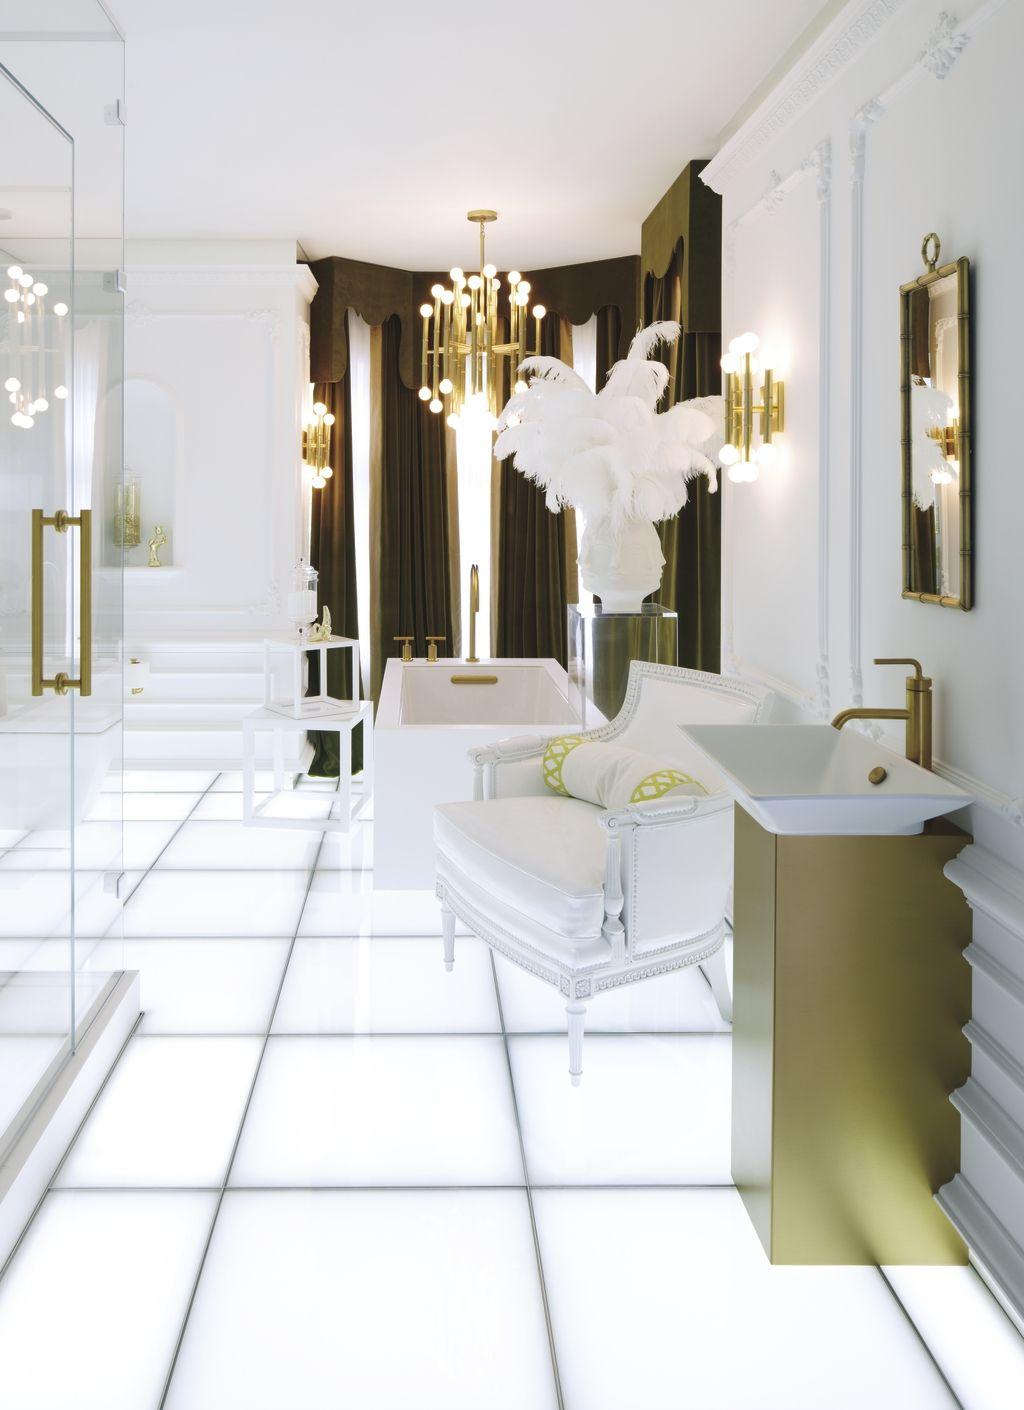 Disco-lit floors, retro hues and futuristic forms create a playful ...